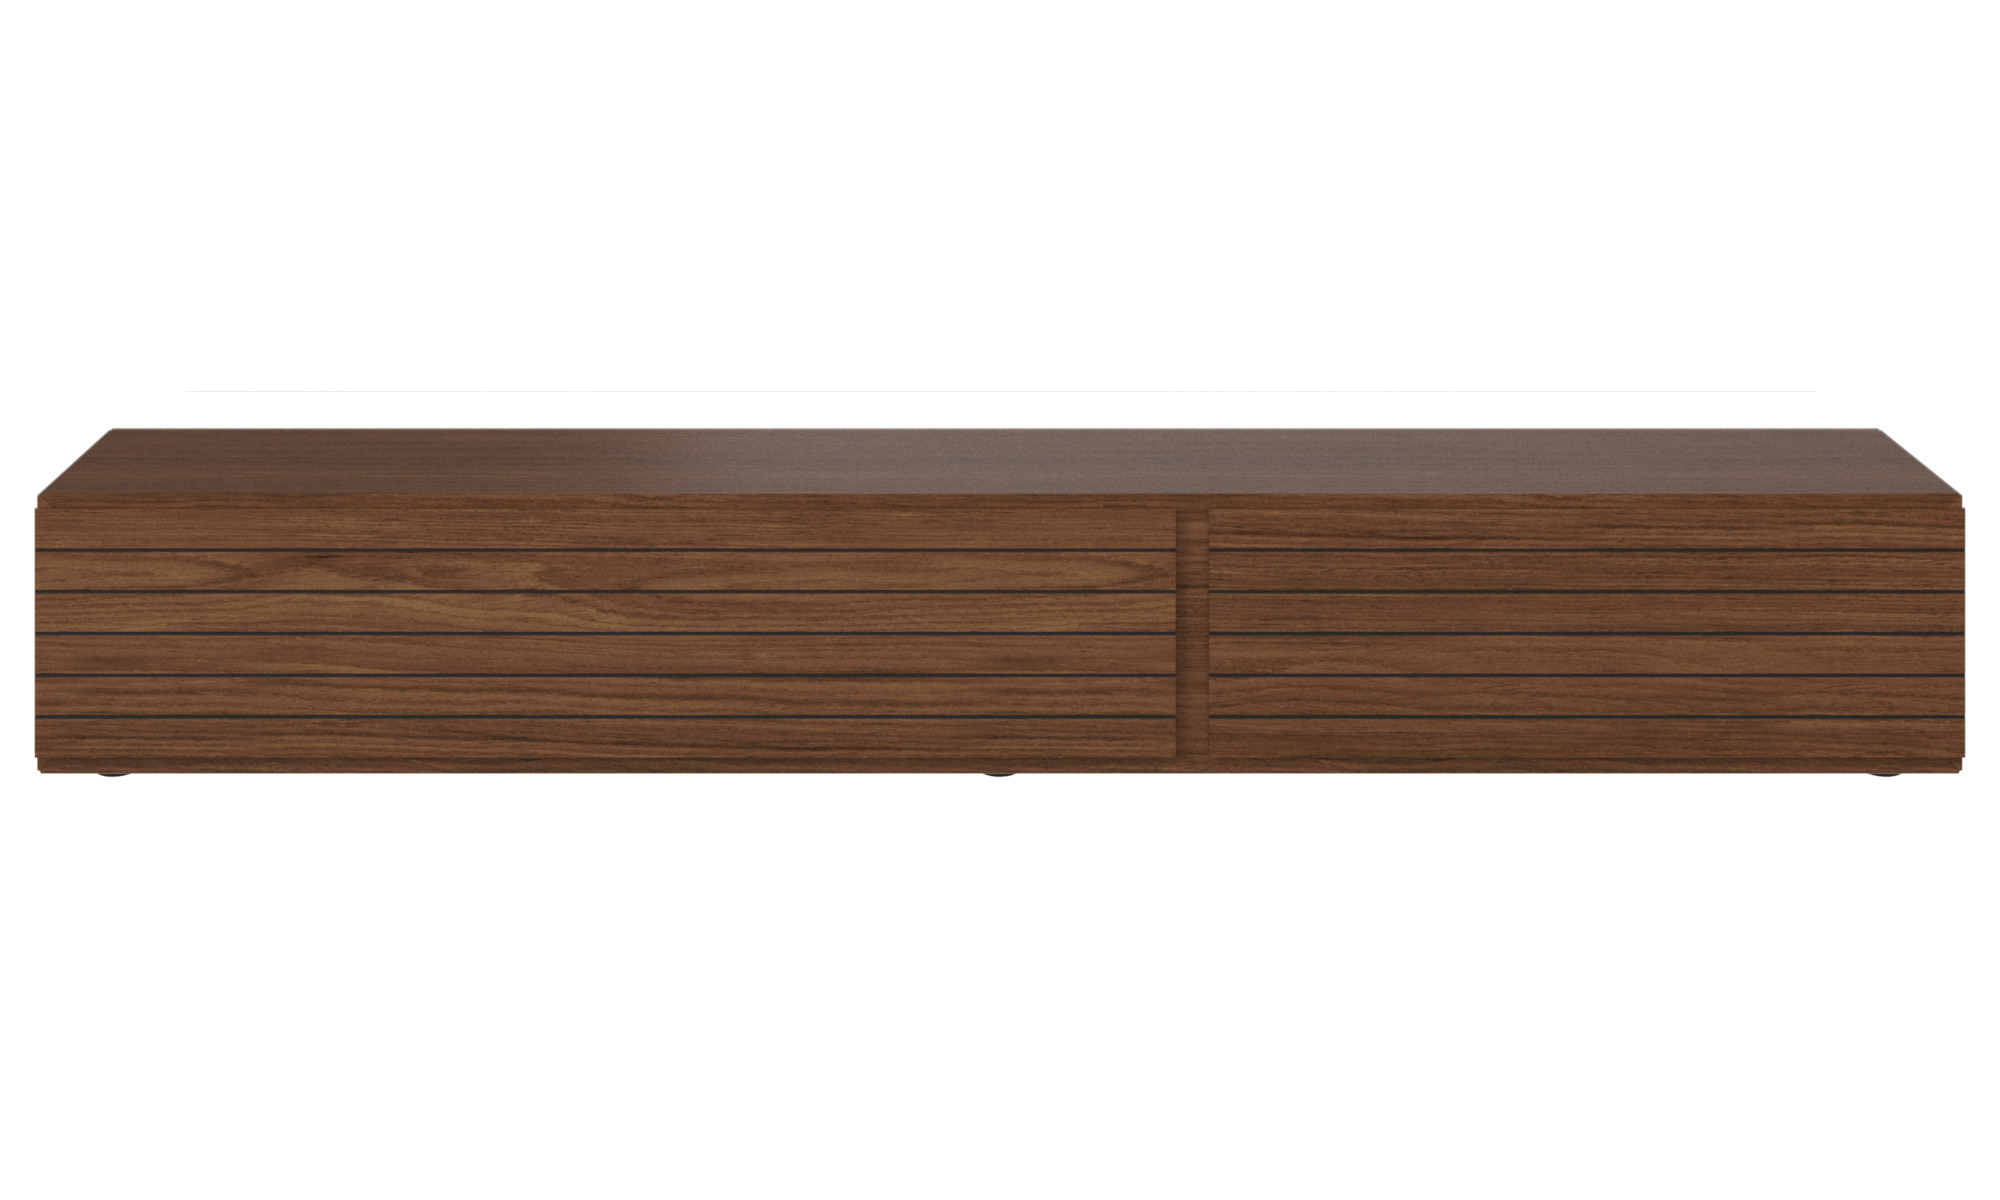 Tv units - Lugano base cabinet with drop down doors - Walnut